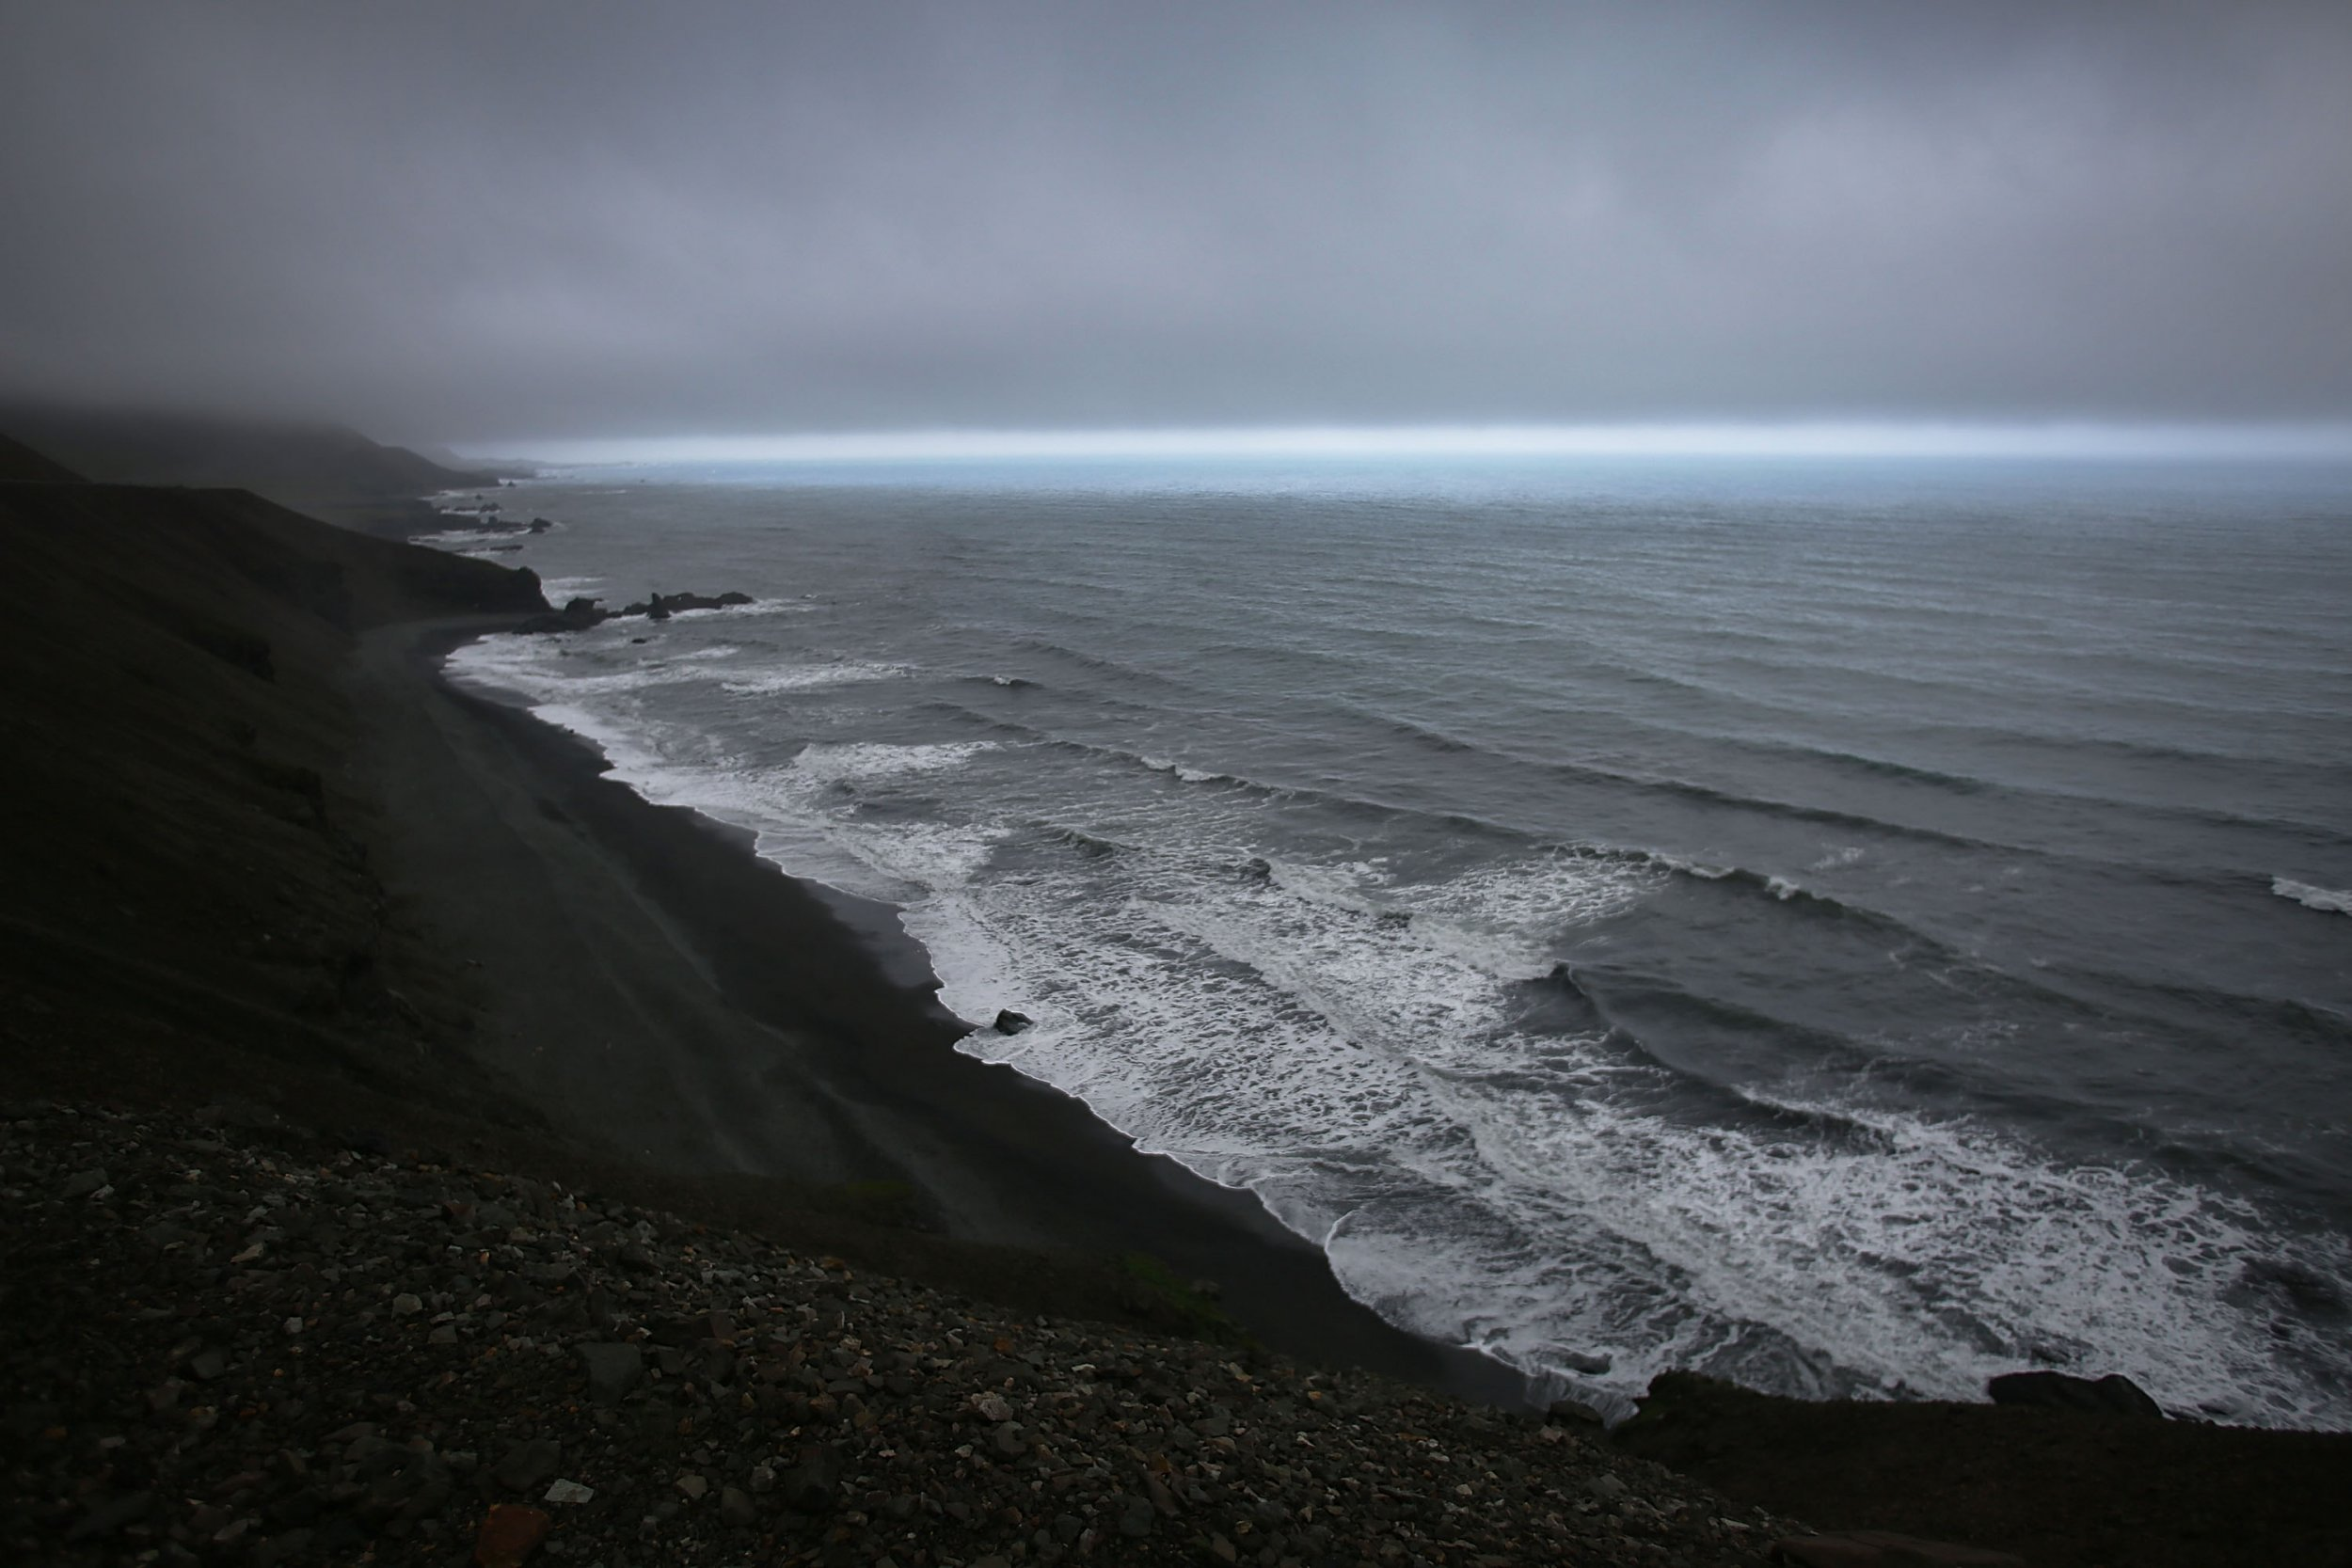 03_13_ocean